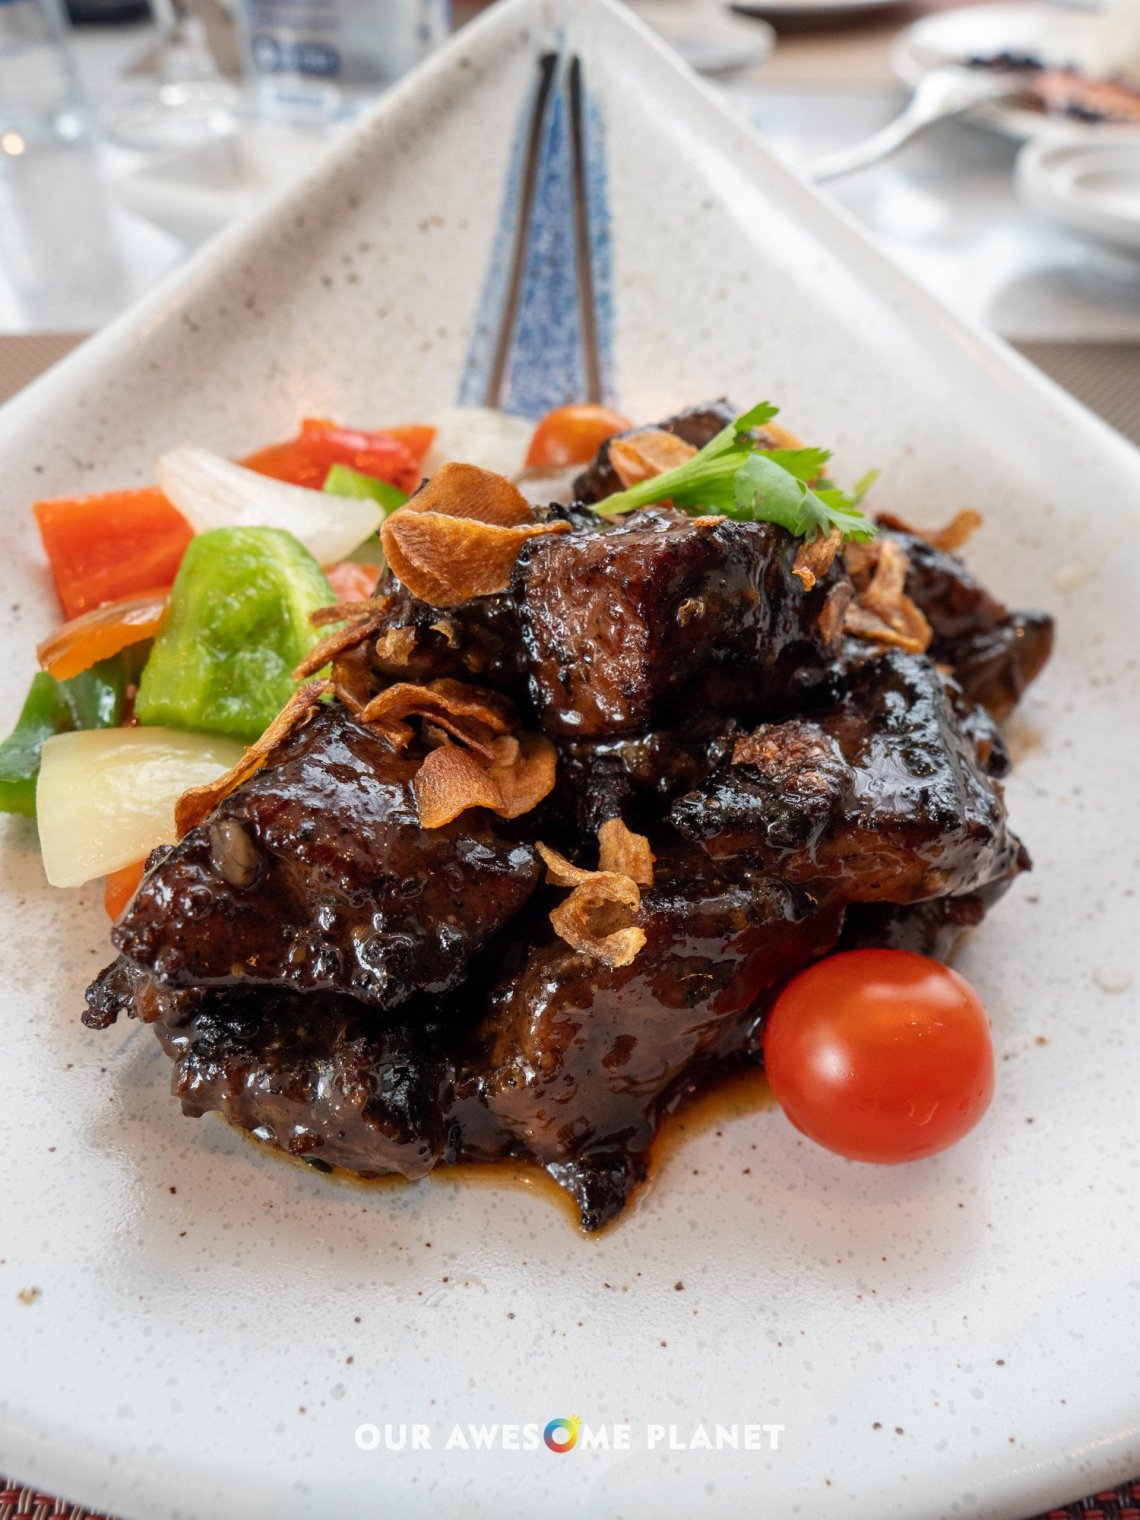 Wok-fried US Beef